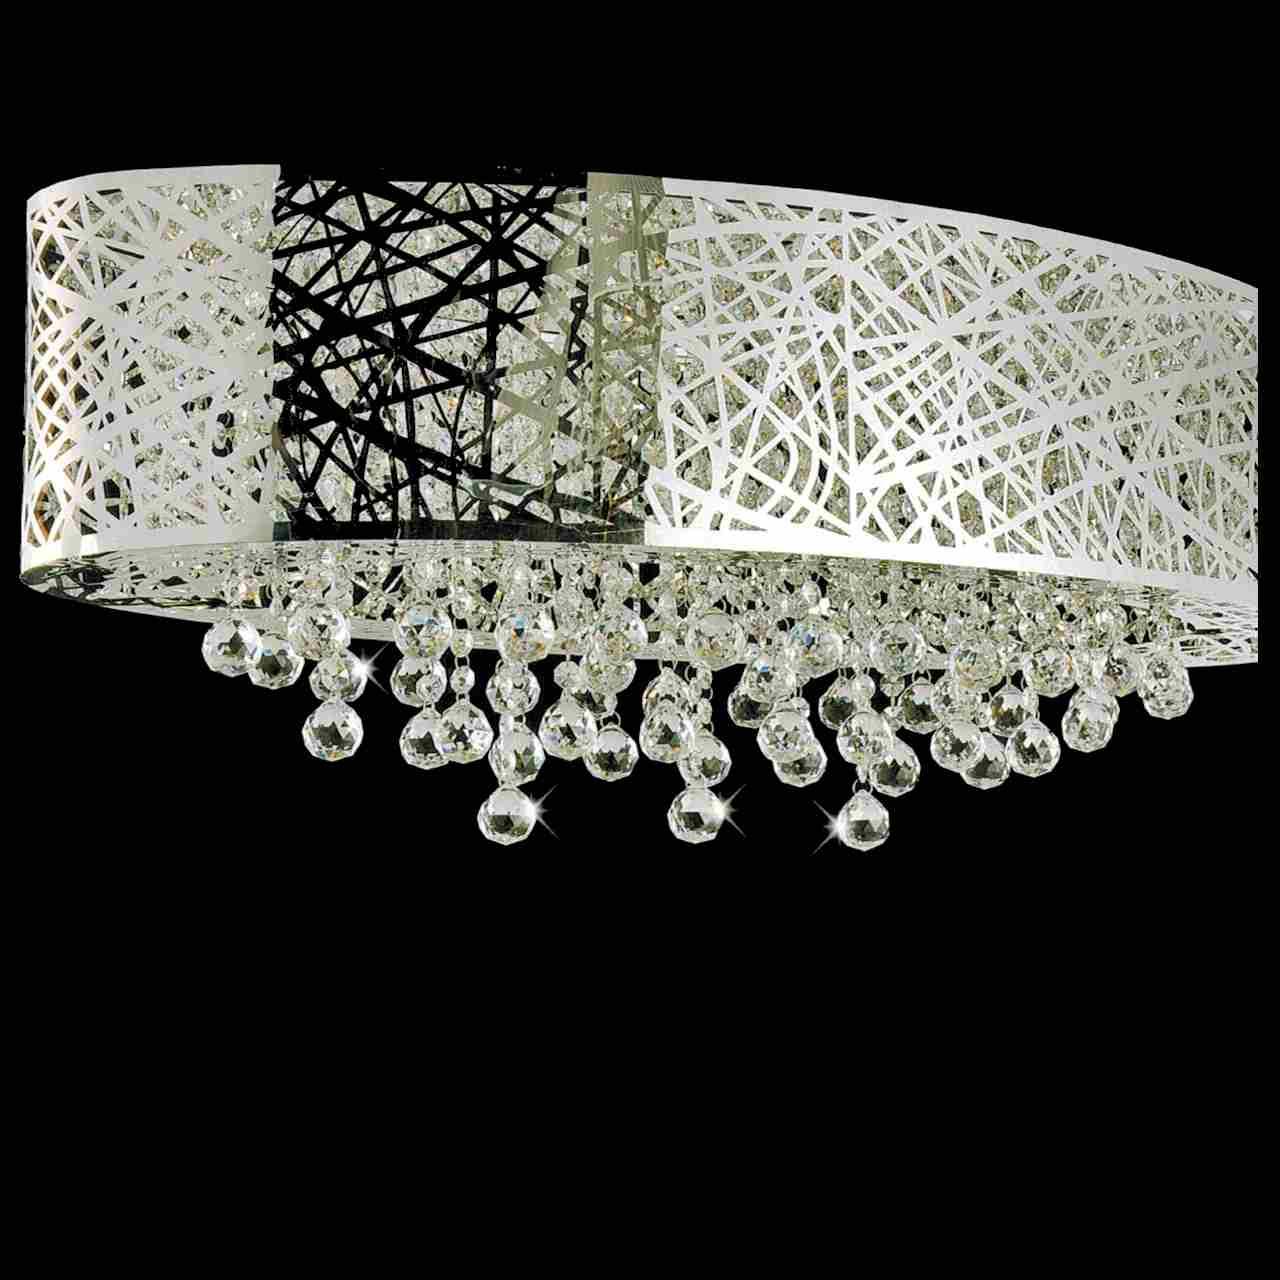 brizzo lighting stores flush mounts -  web modern laser cut shade crystal oval flush mount chandelierstainless steel  lights